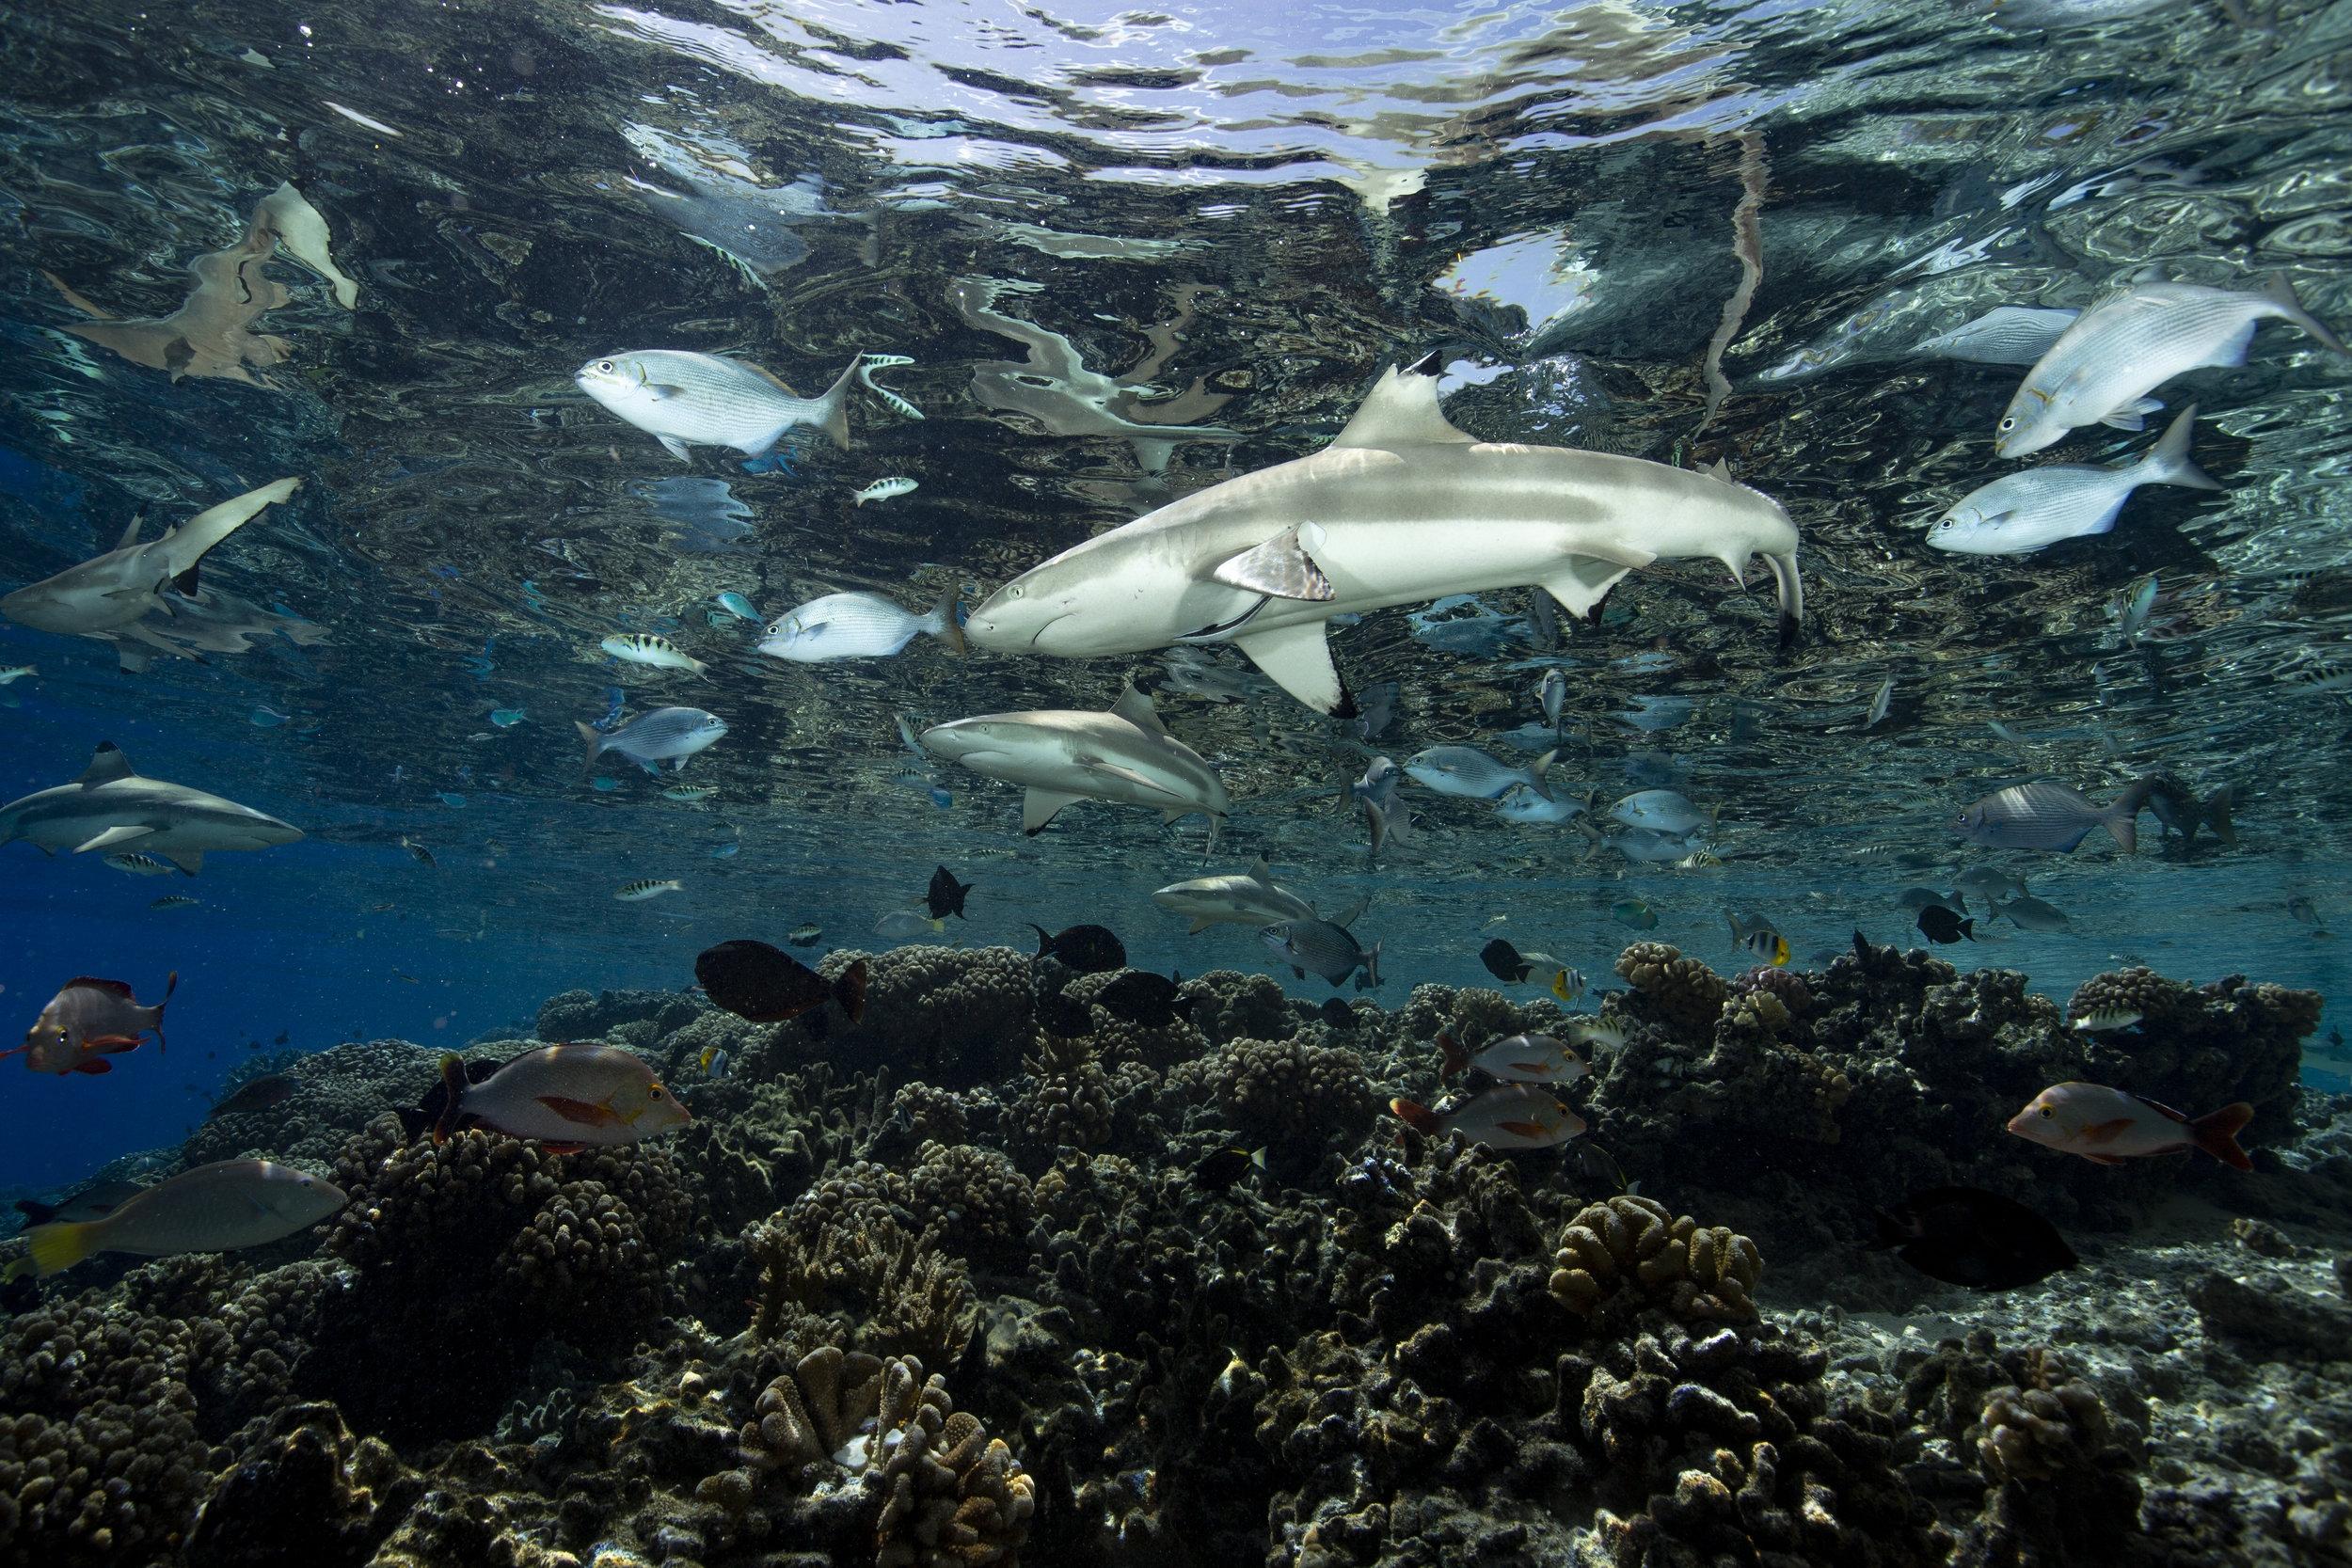 sHARK IN FAKARAVA DURING GROUPER SPAWNING CREDIT: RICK MISKIV / coral reef image bank